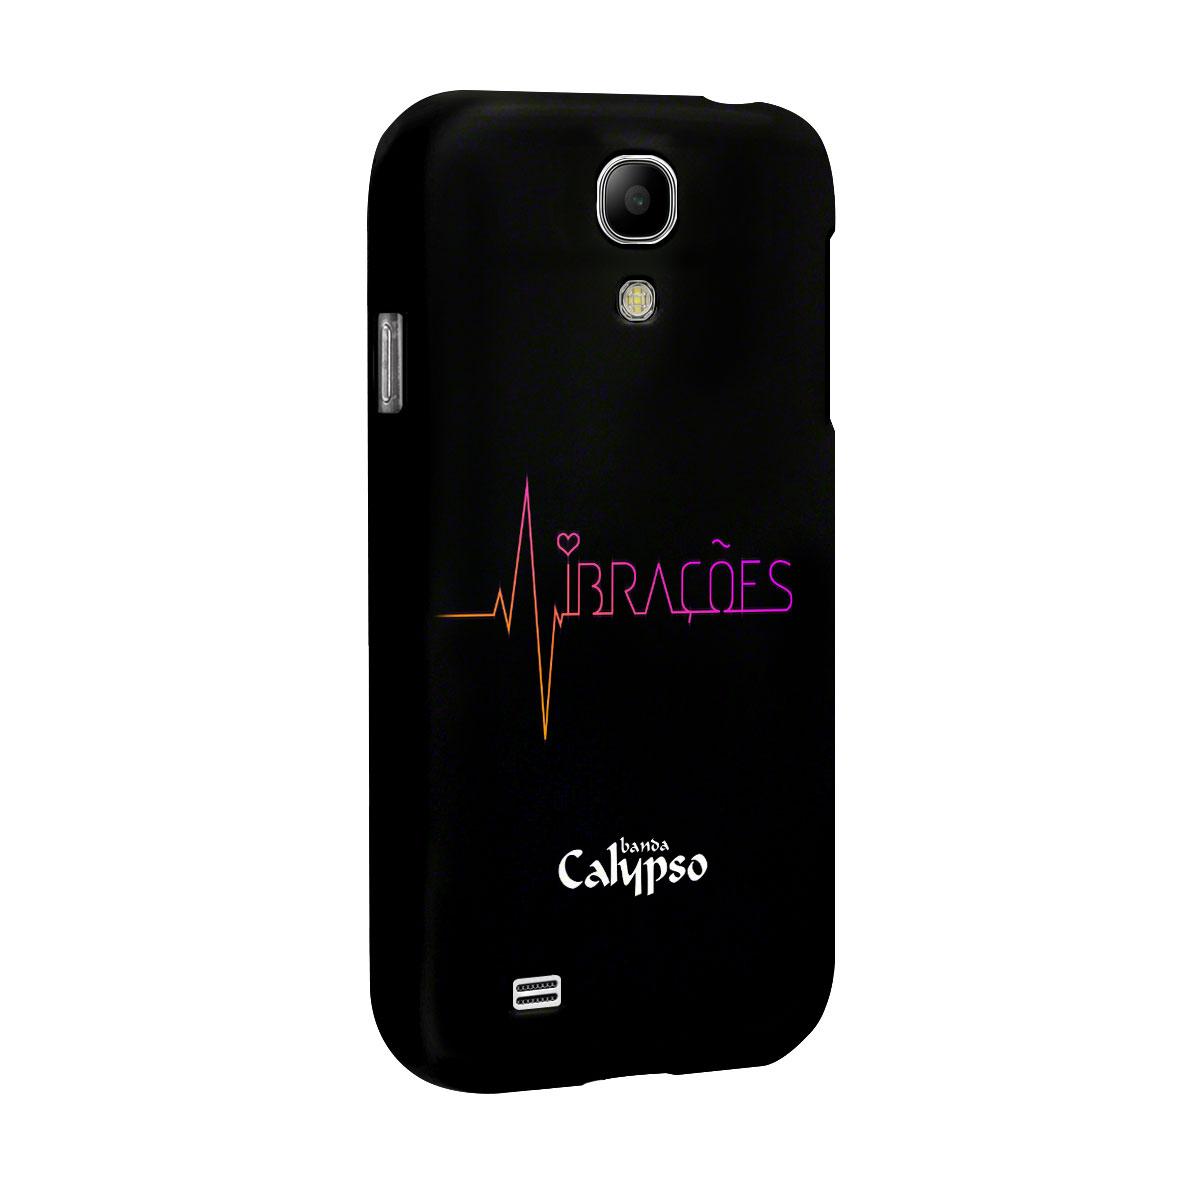 Capa de Celular Samsung Galaxy Calypso S4 Vibra��es